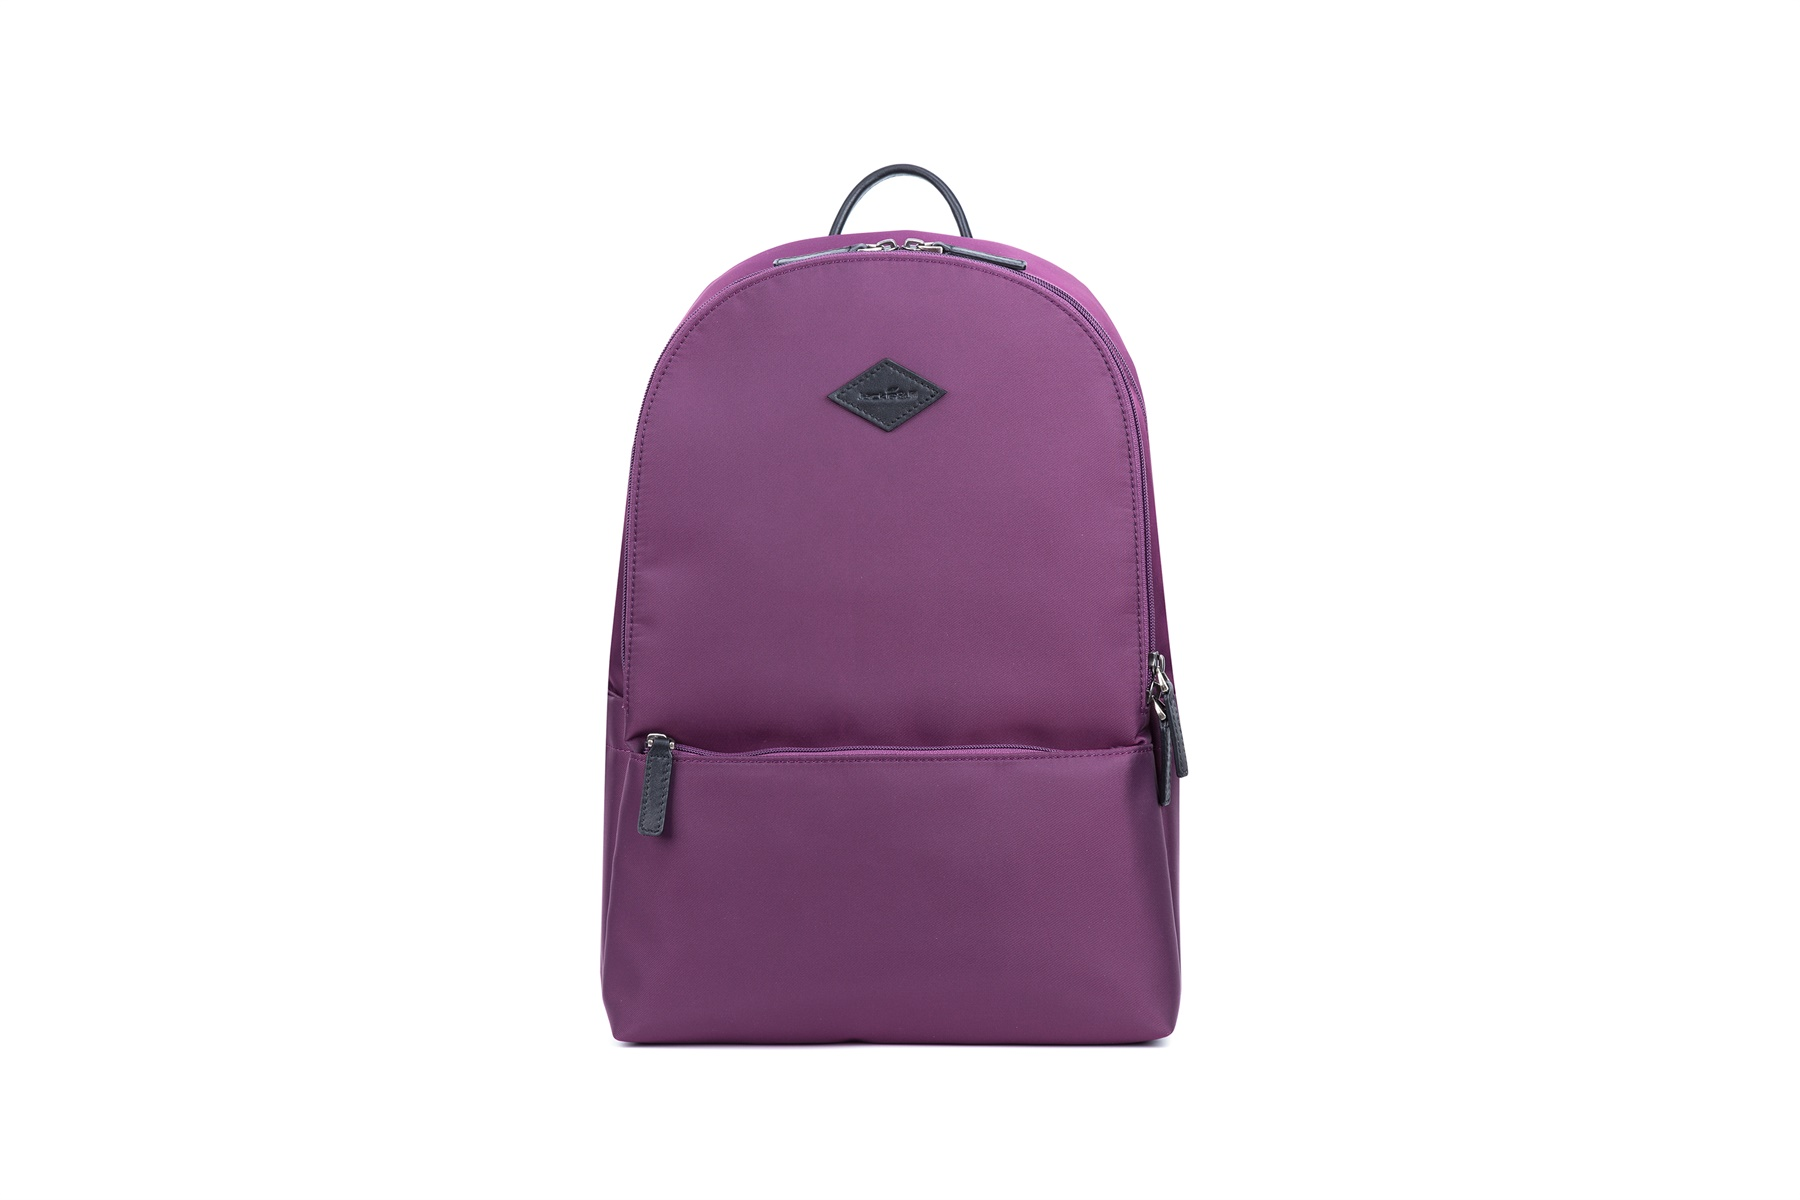 GF bags-Professional Stylish Backpacks Big Backpack Bags Manufacture-4